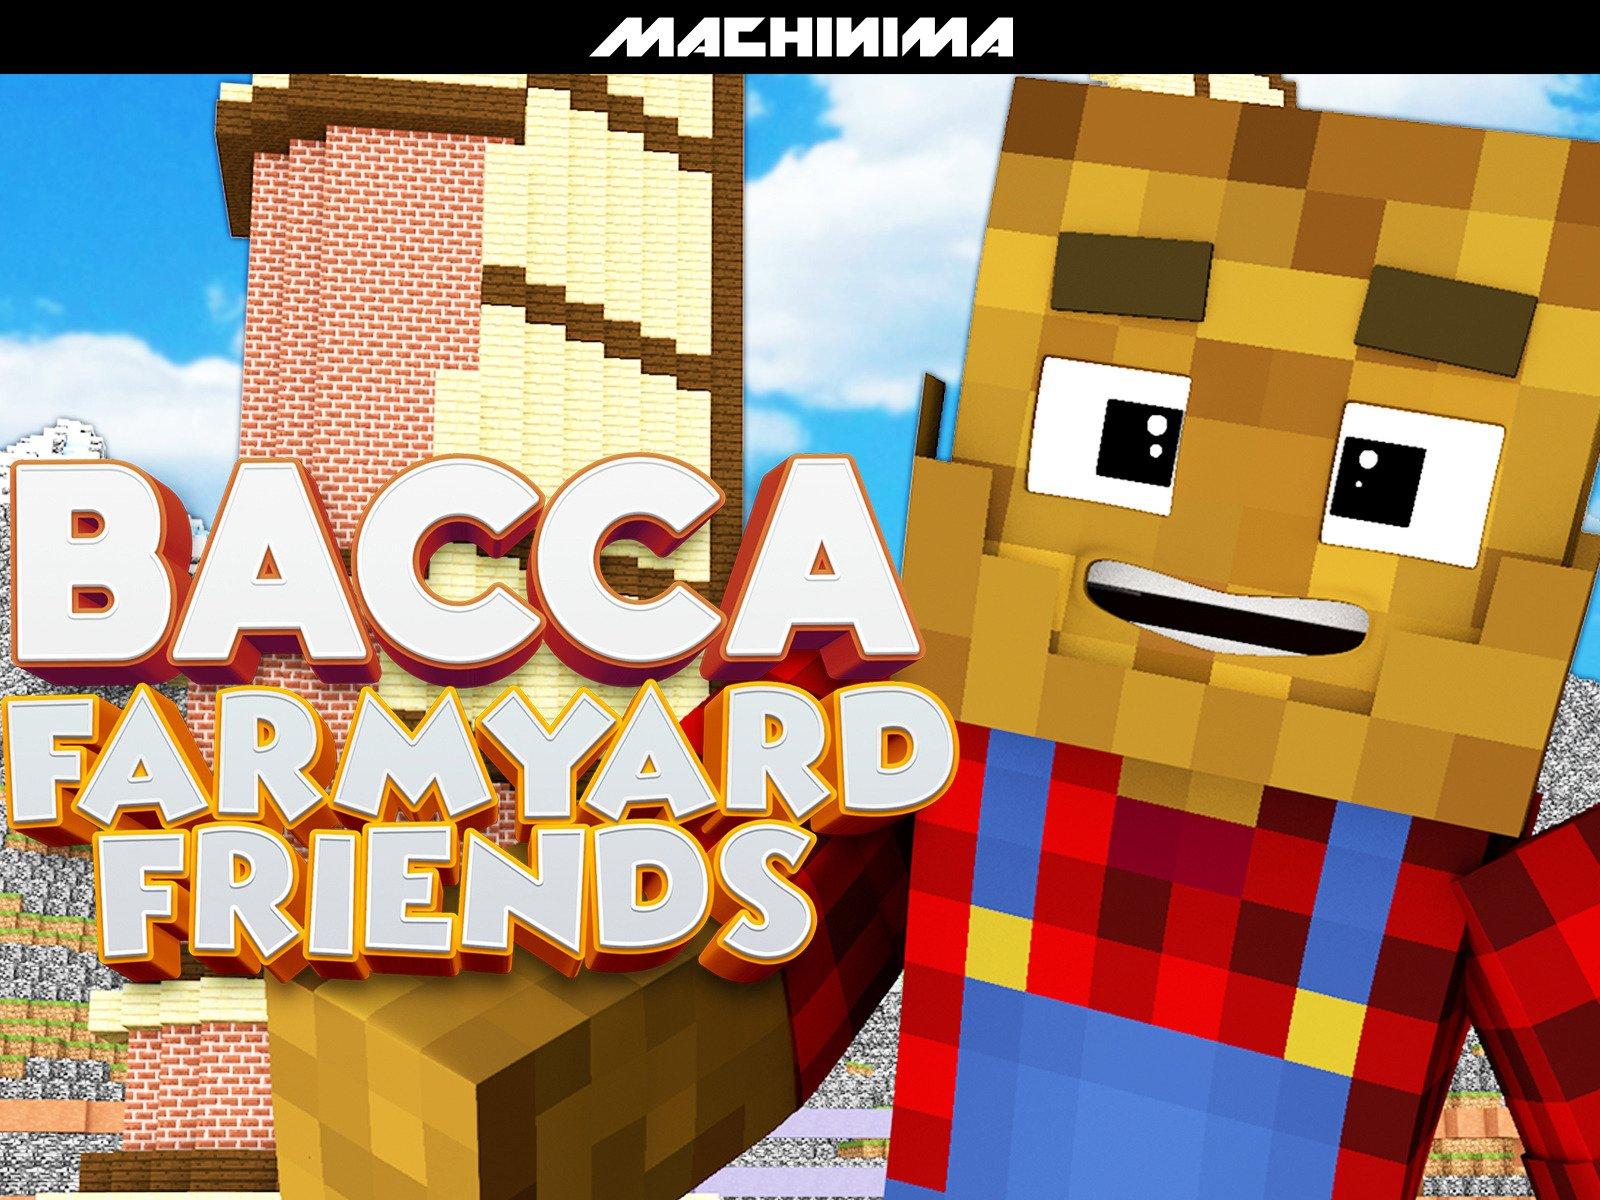 Clip: Bacca Farmyard Friends - Season 4